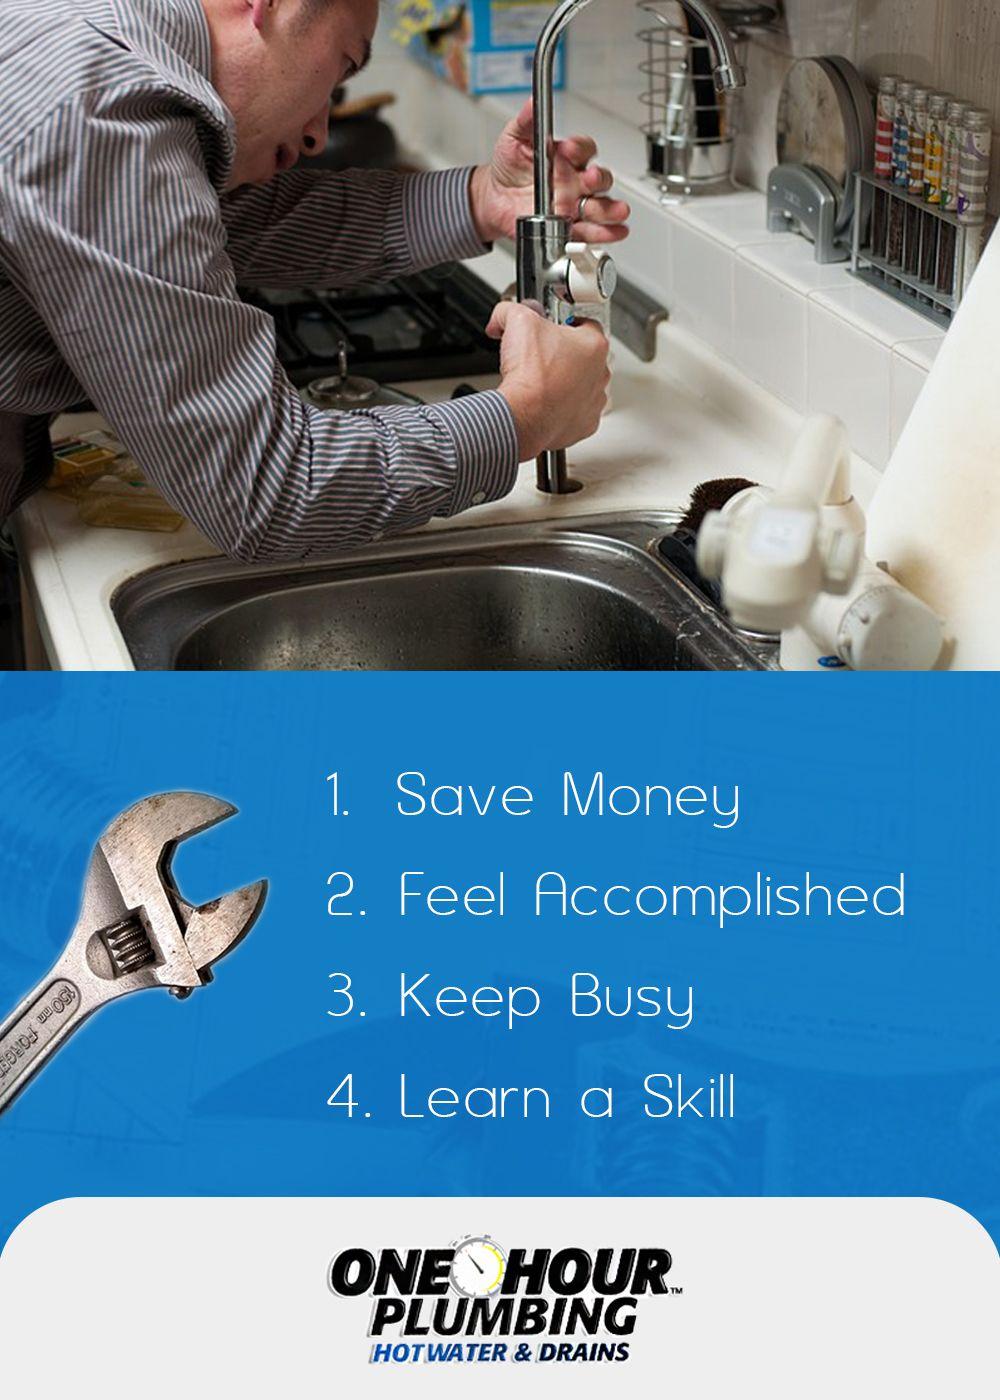 Pin by Emergency Plumbing on DIY   Water plumbing ...